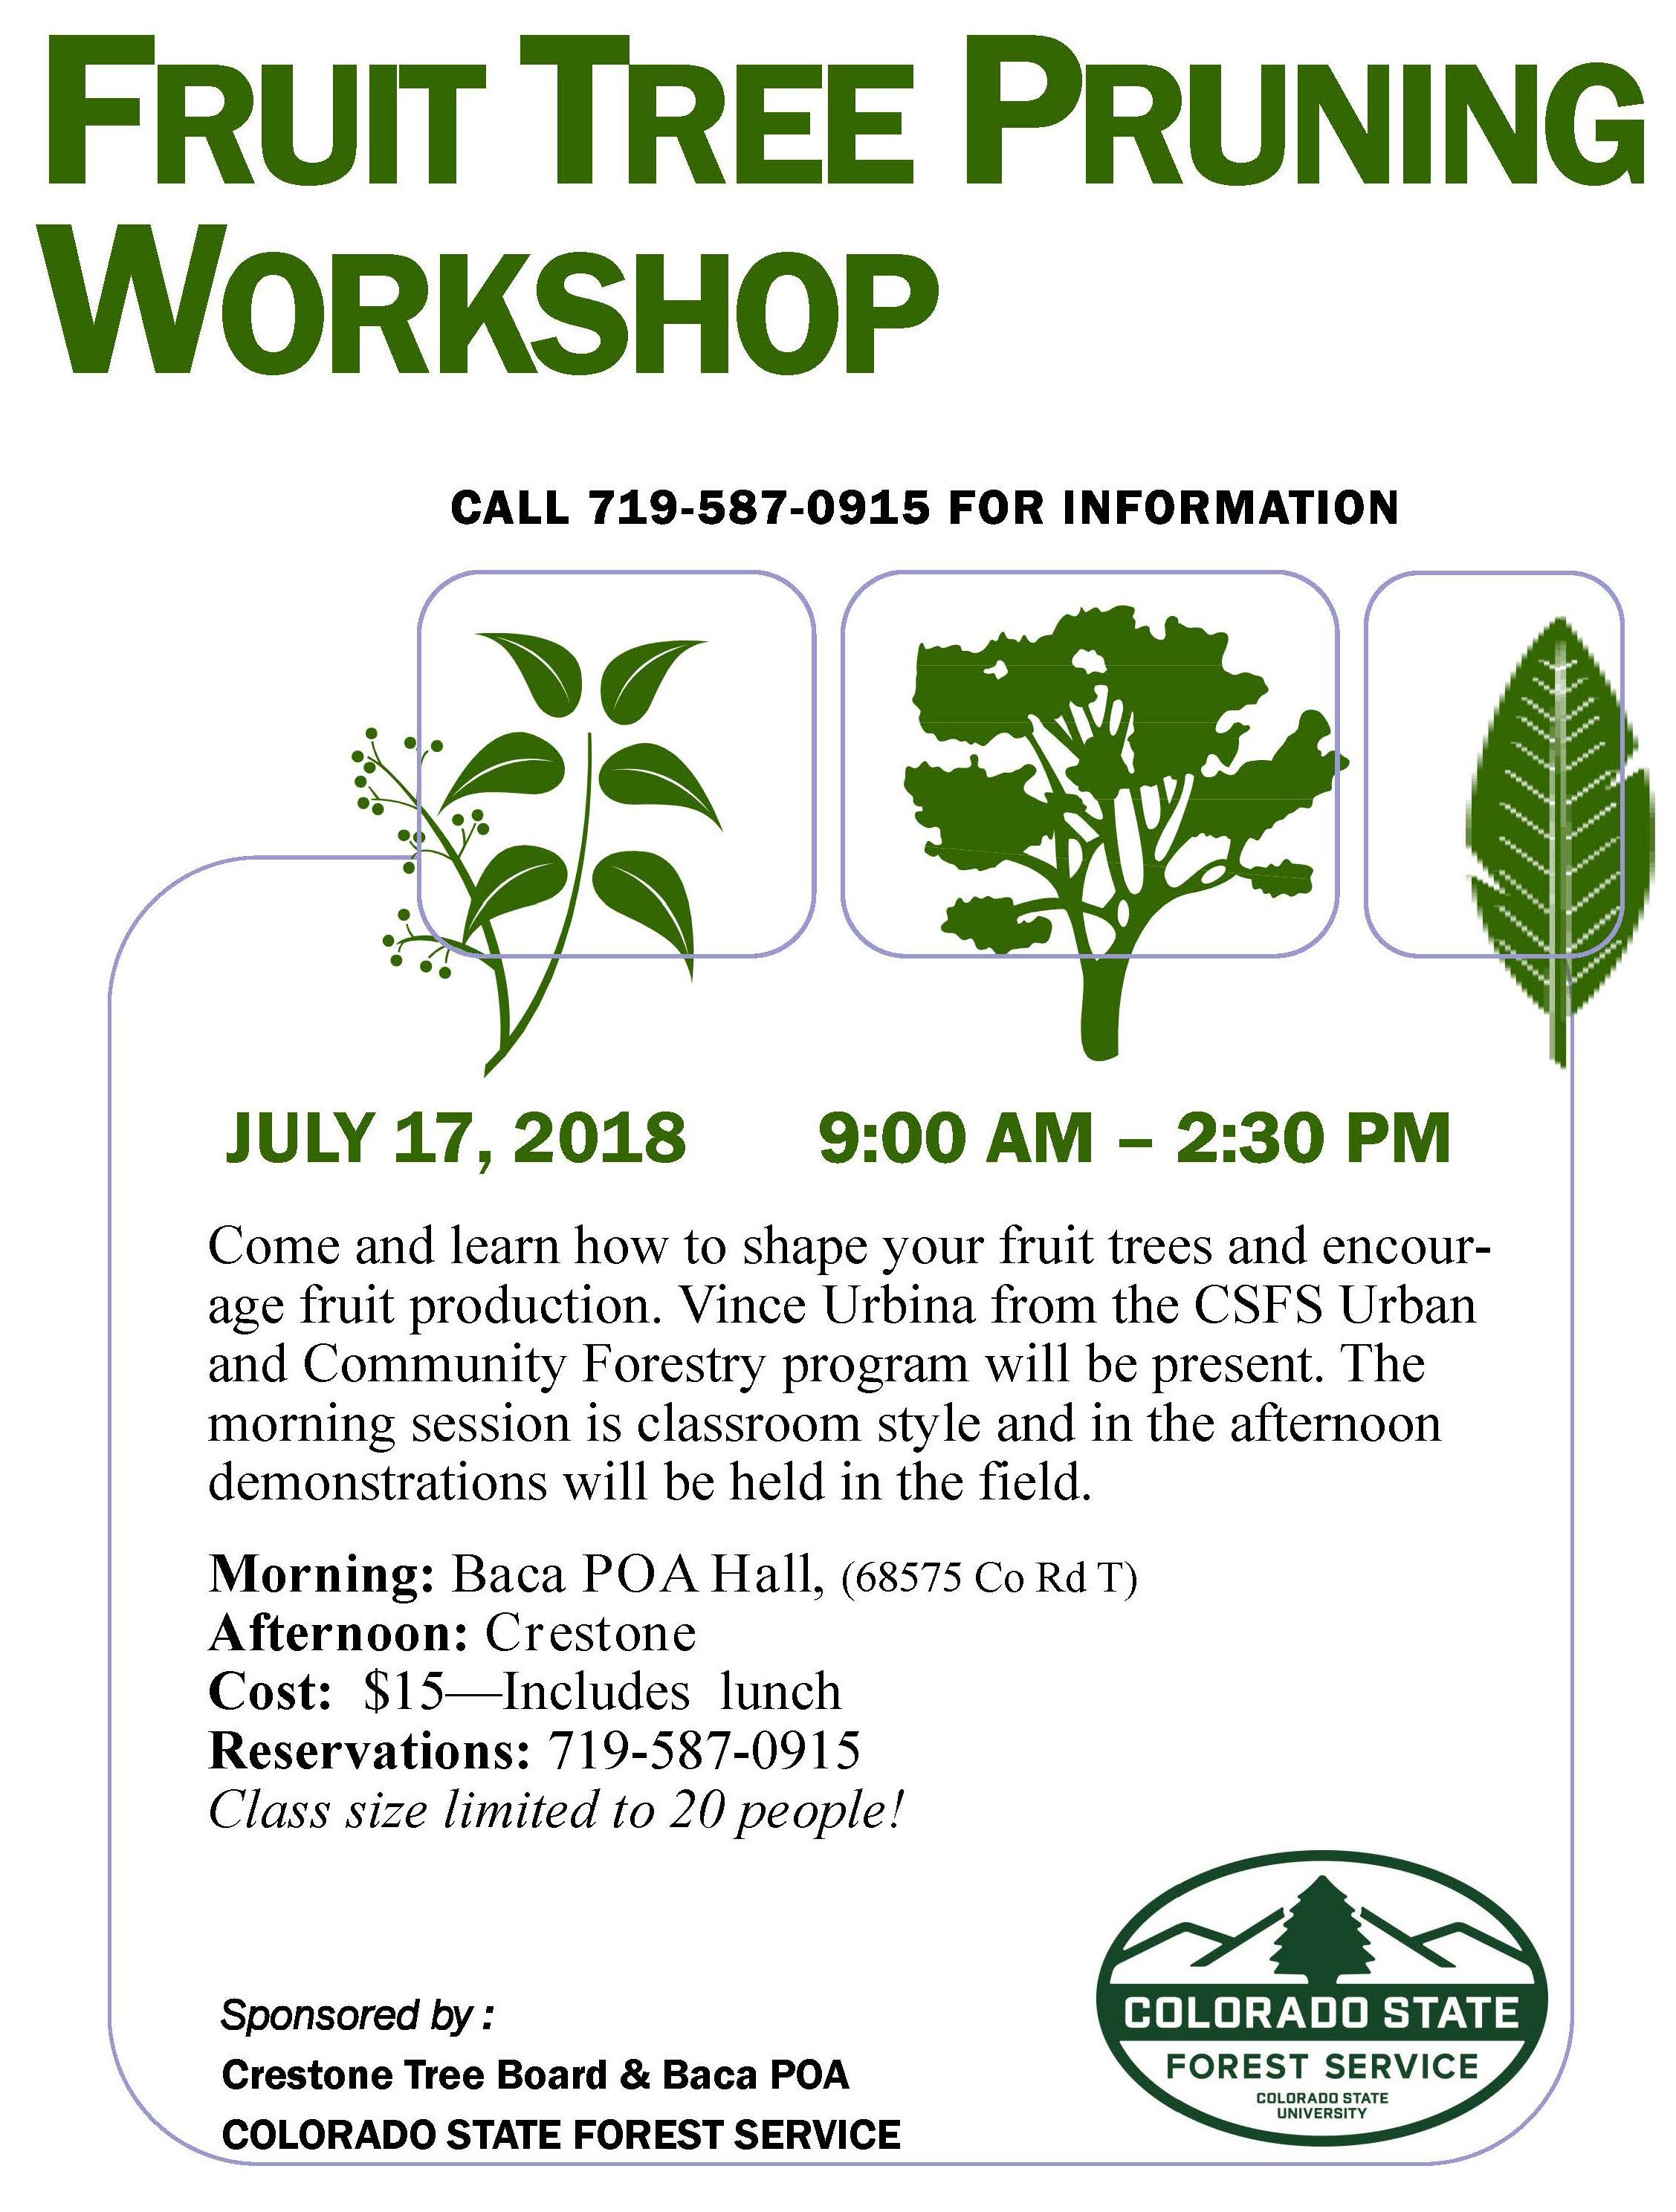 Fruit Pruning Workshop Flyer 2018.jpg